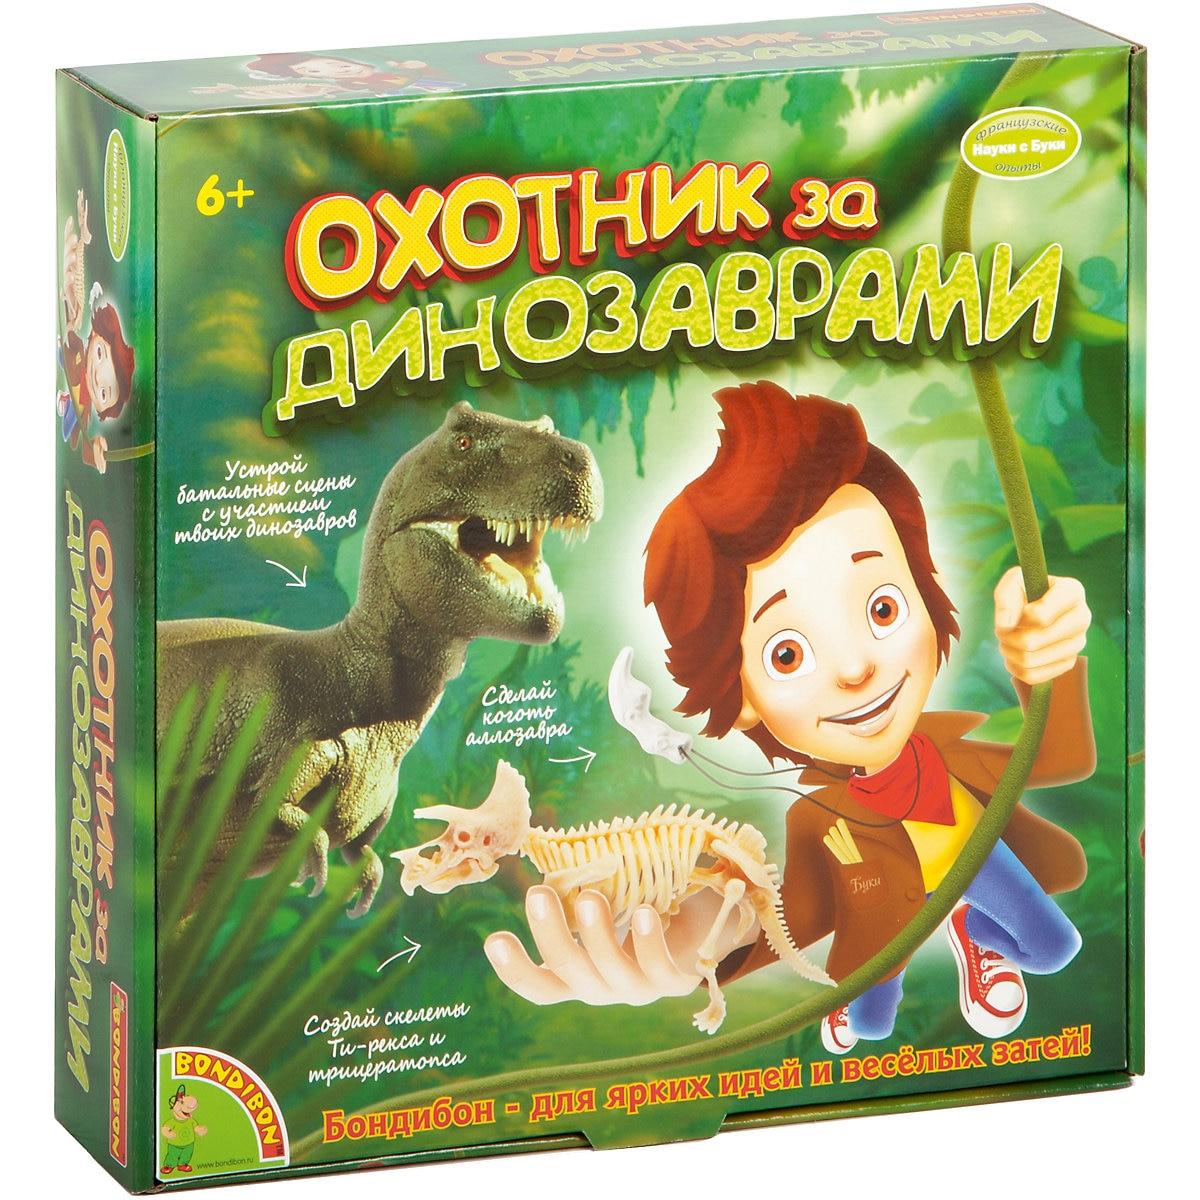 Bondibon Science 7420074 Experiments for children Educational toys Training toy Learning & Education MTpromo цены